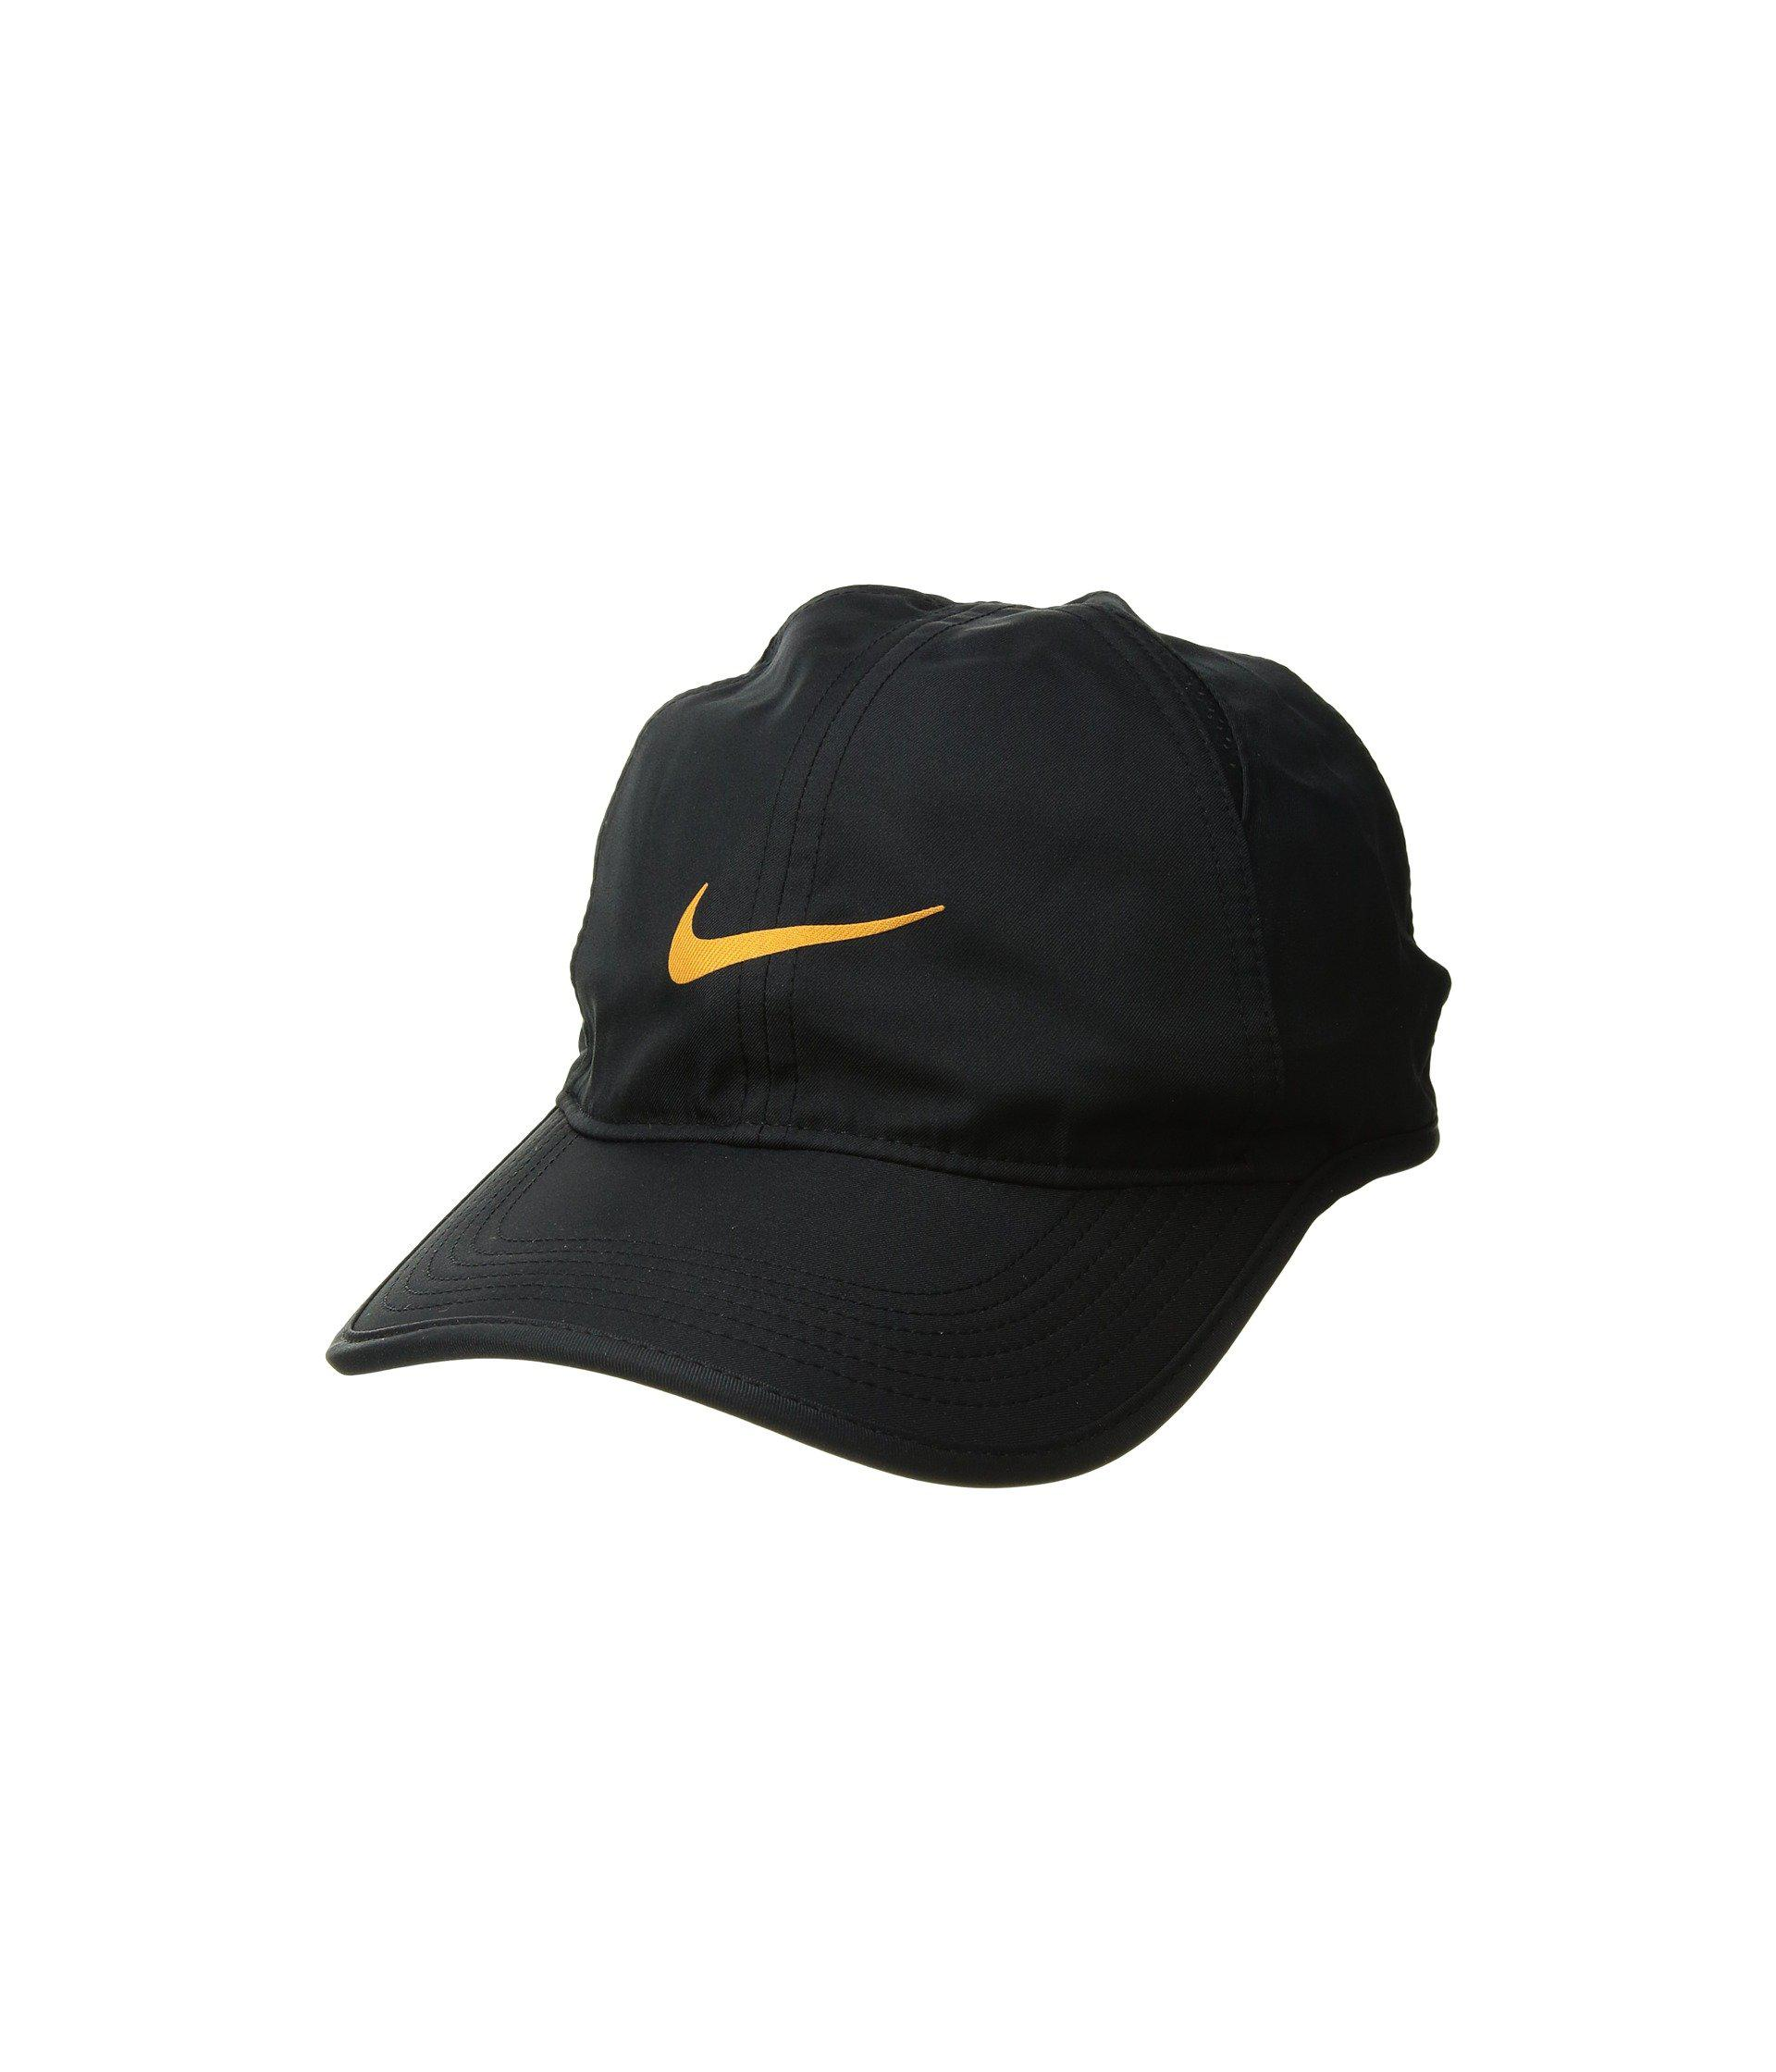 f9fa479779e Lyst - Nike Featherlight Cap (black white) Caps in Black for Men